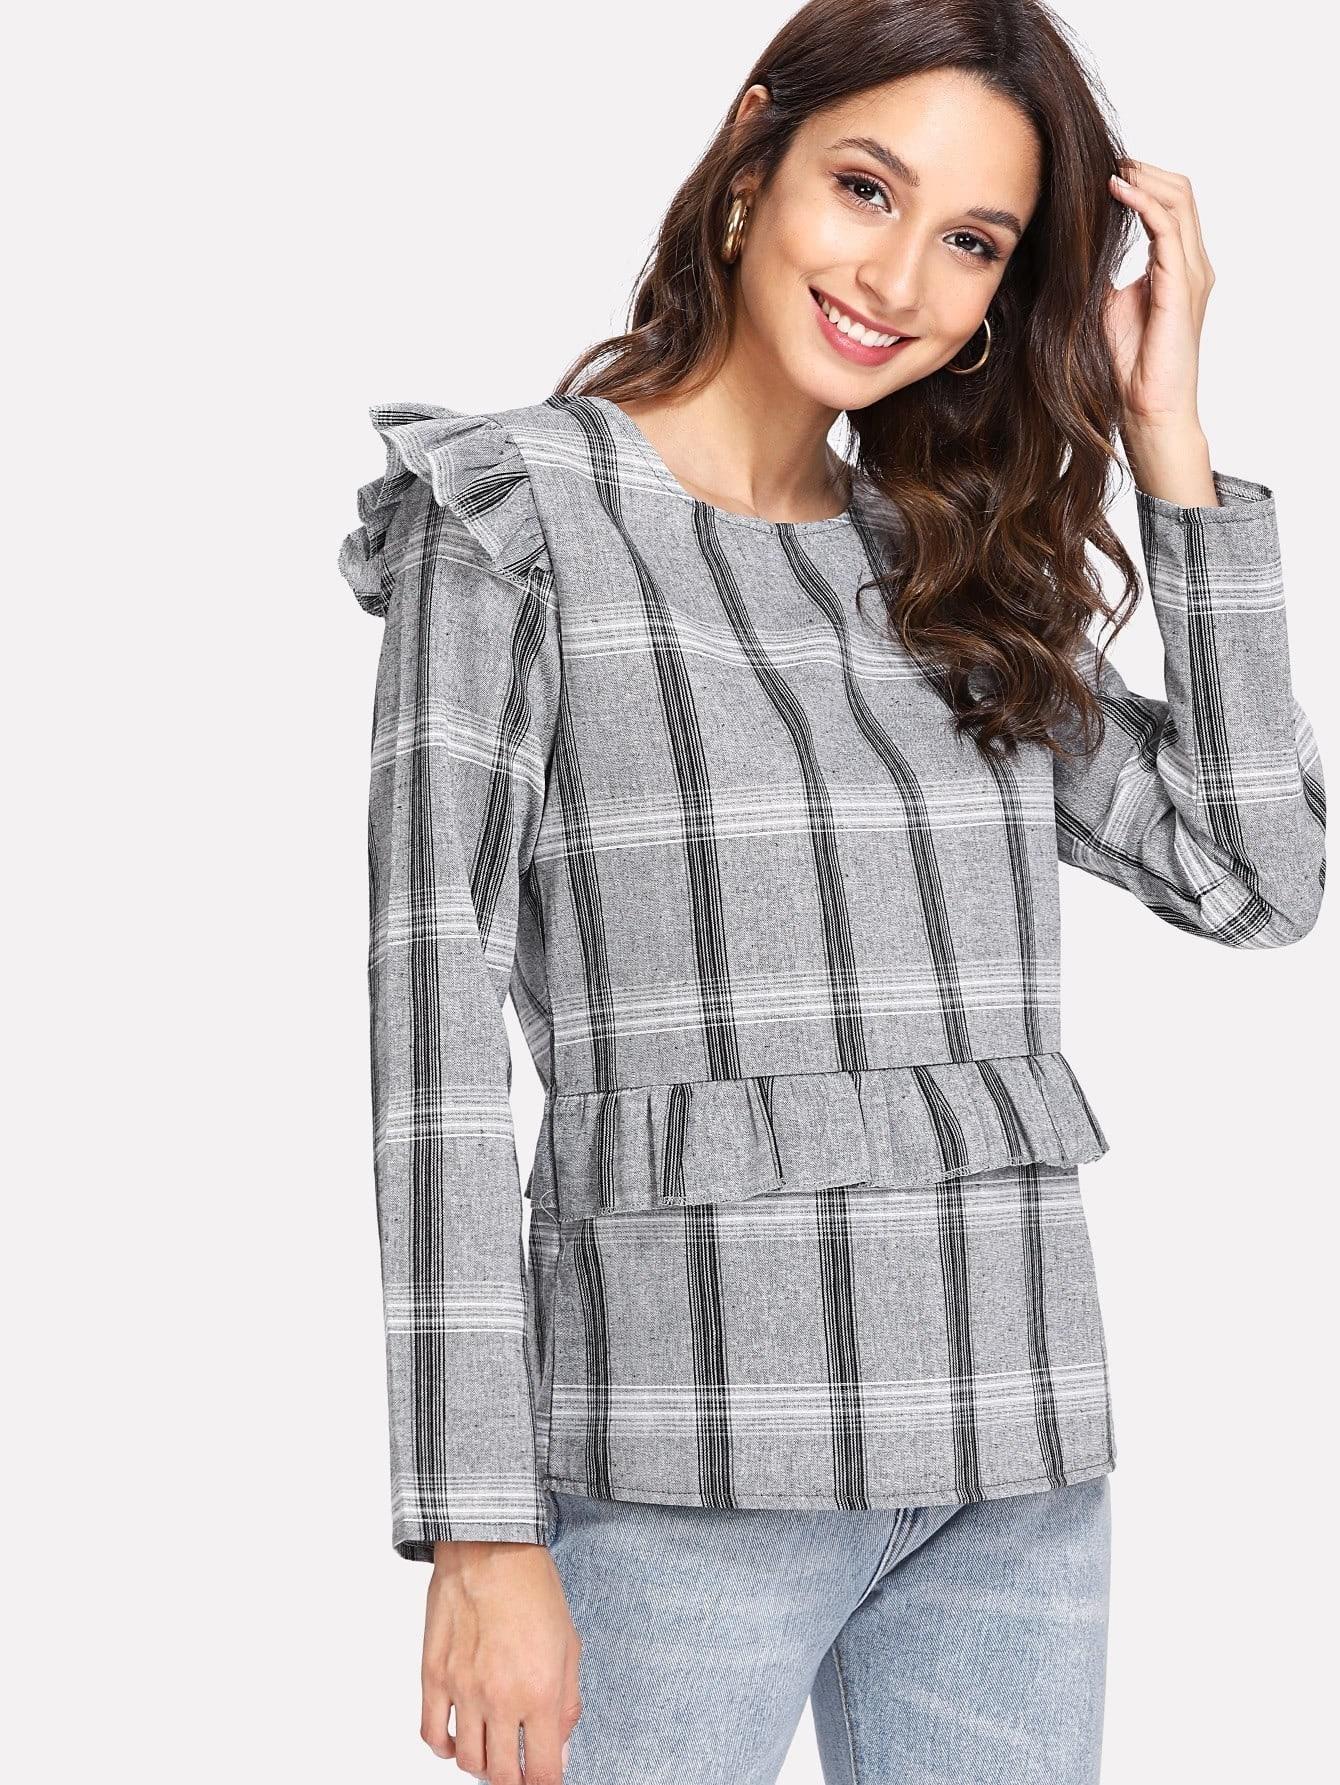 Ruffle Trim Plaid Blouse drawstring front ruffle plaid blouse